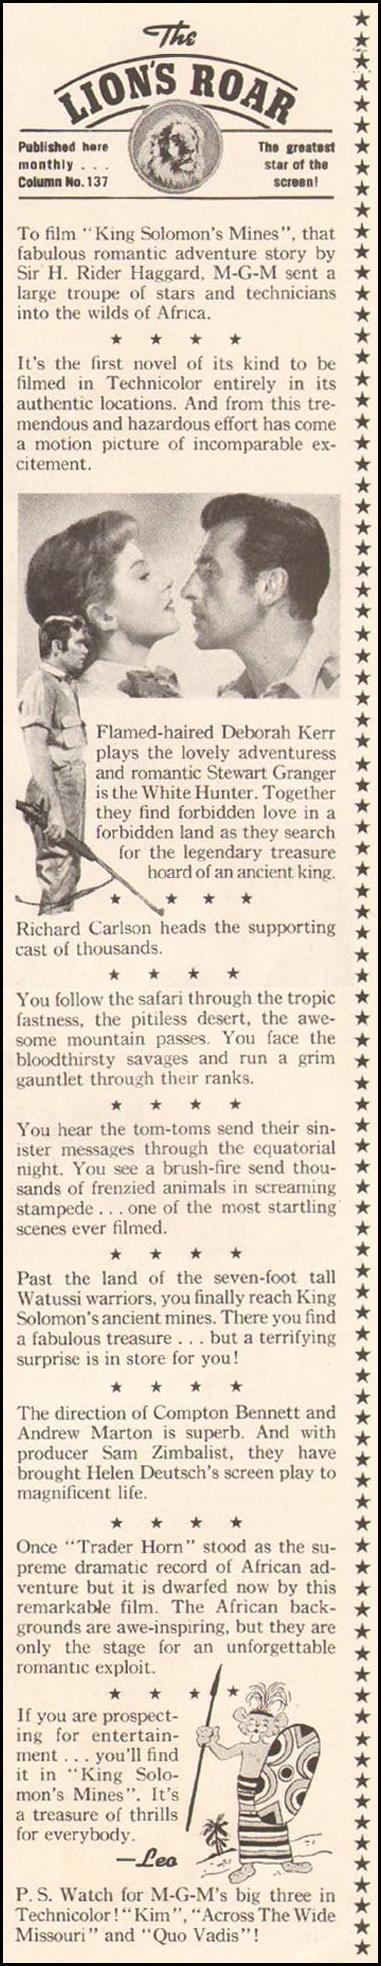 KING SOLOMON'S MINES LADIES' HOME JOURNAL 11/01/1950 p. 3